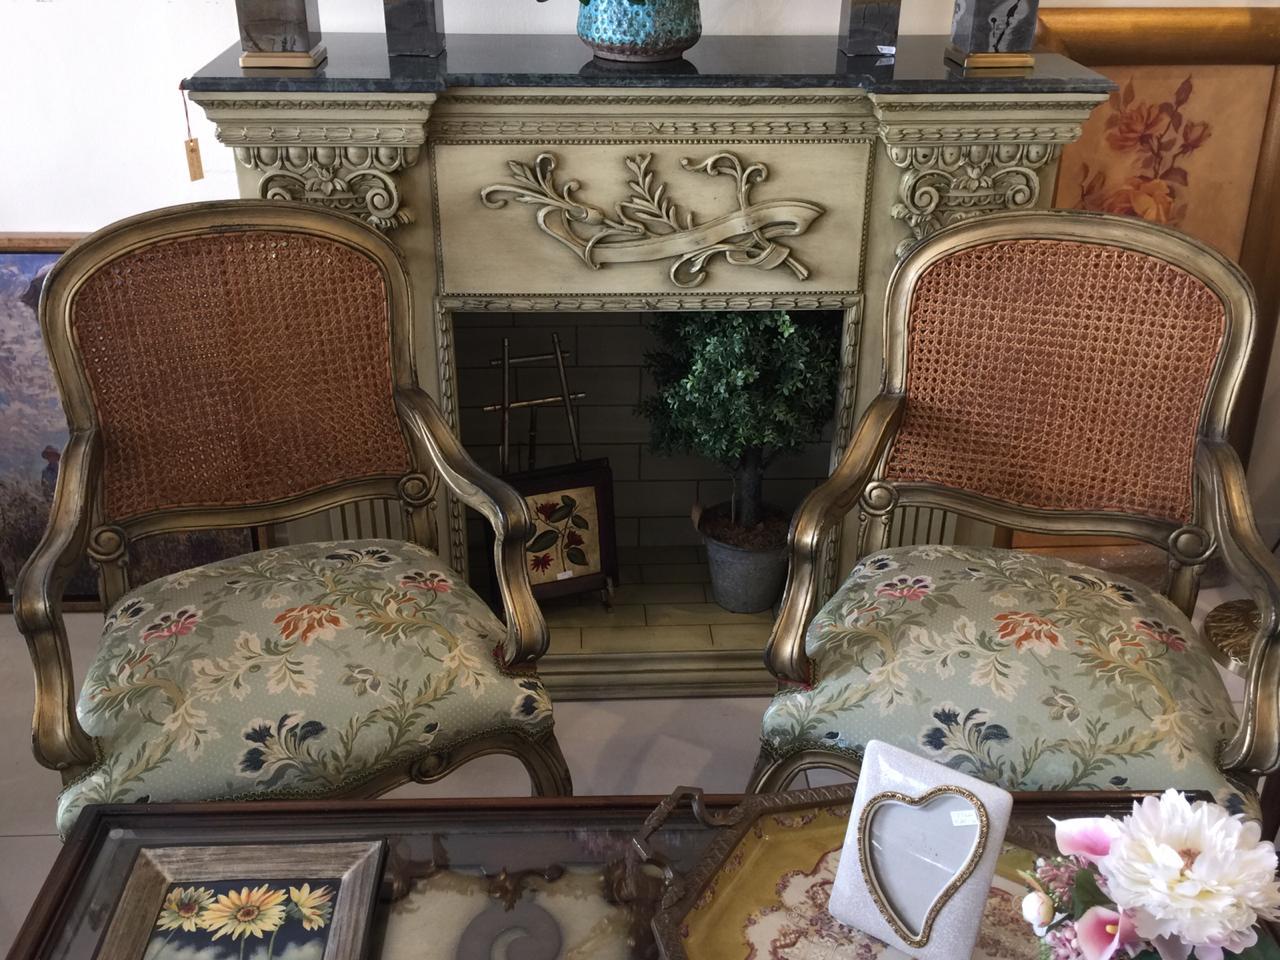 Casabella Home Furnishing And Accessories - كازا بيلا للأثاث والإكسسوارات المنزلية الفاخرة